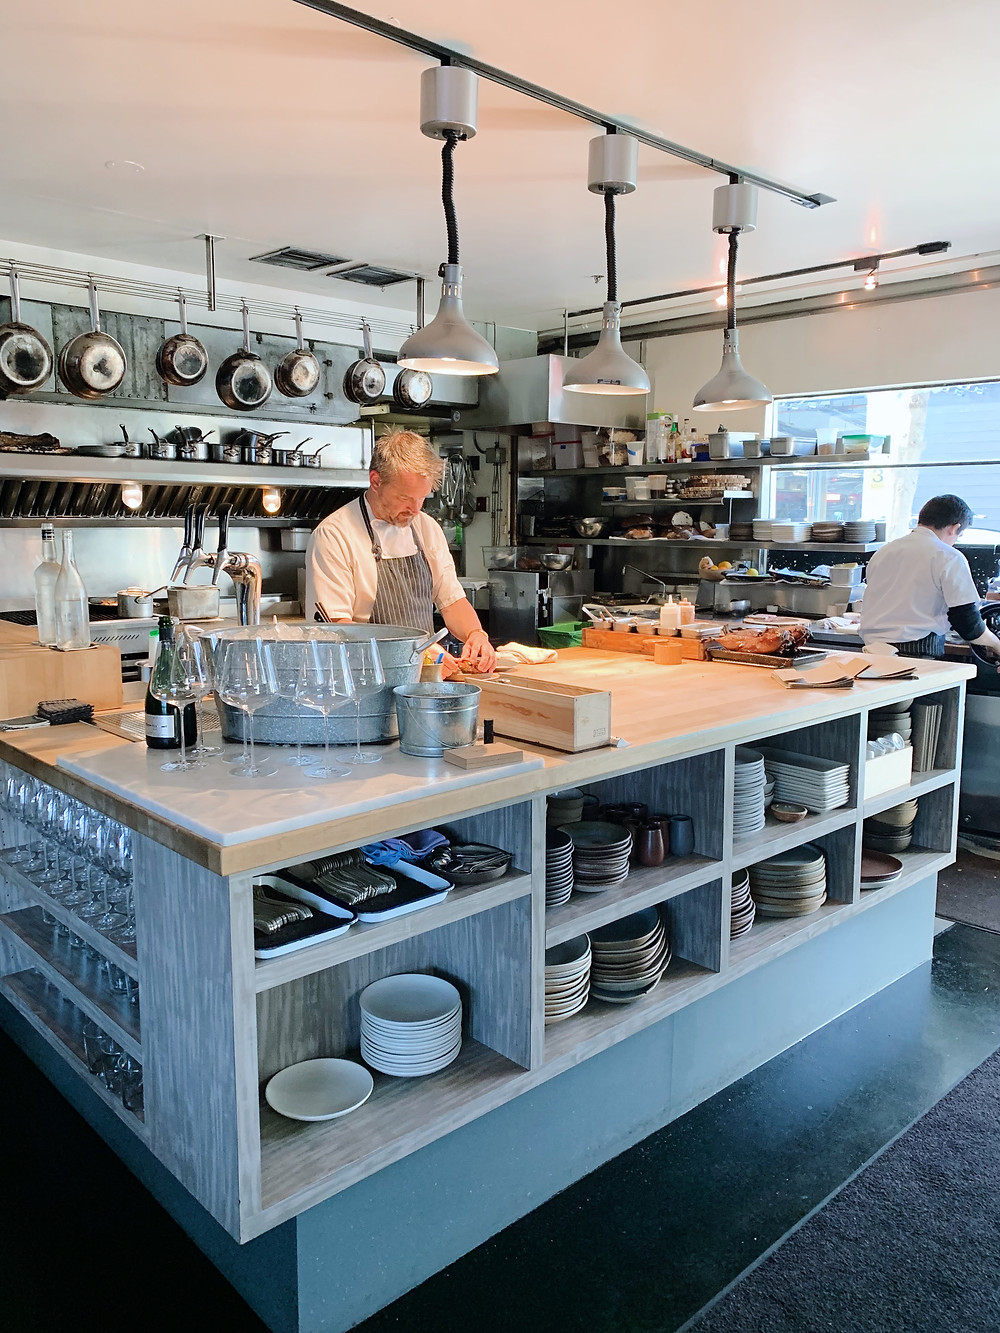 Kitchen at The Morris restaurant in San Francisco, USA